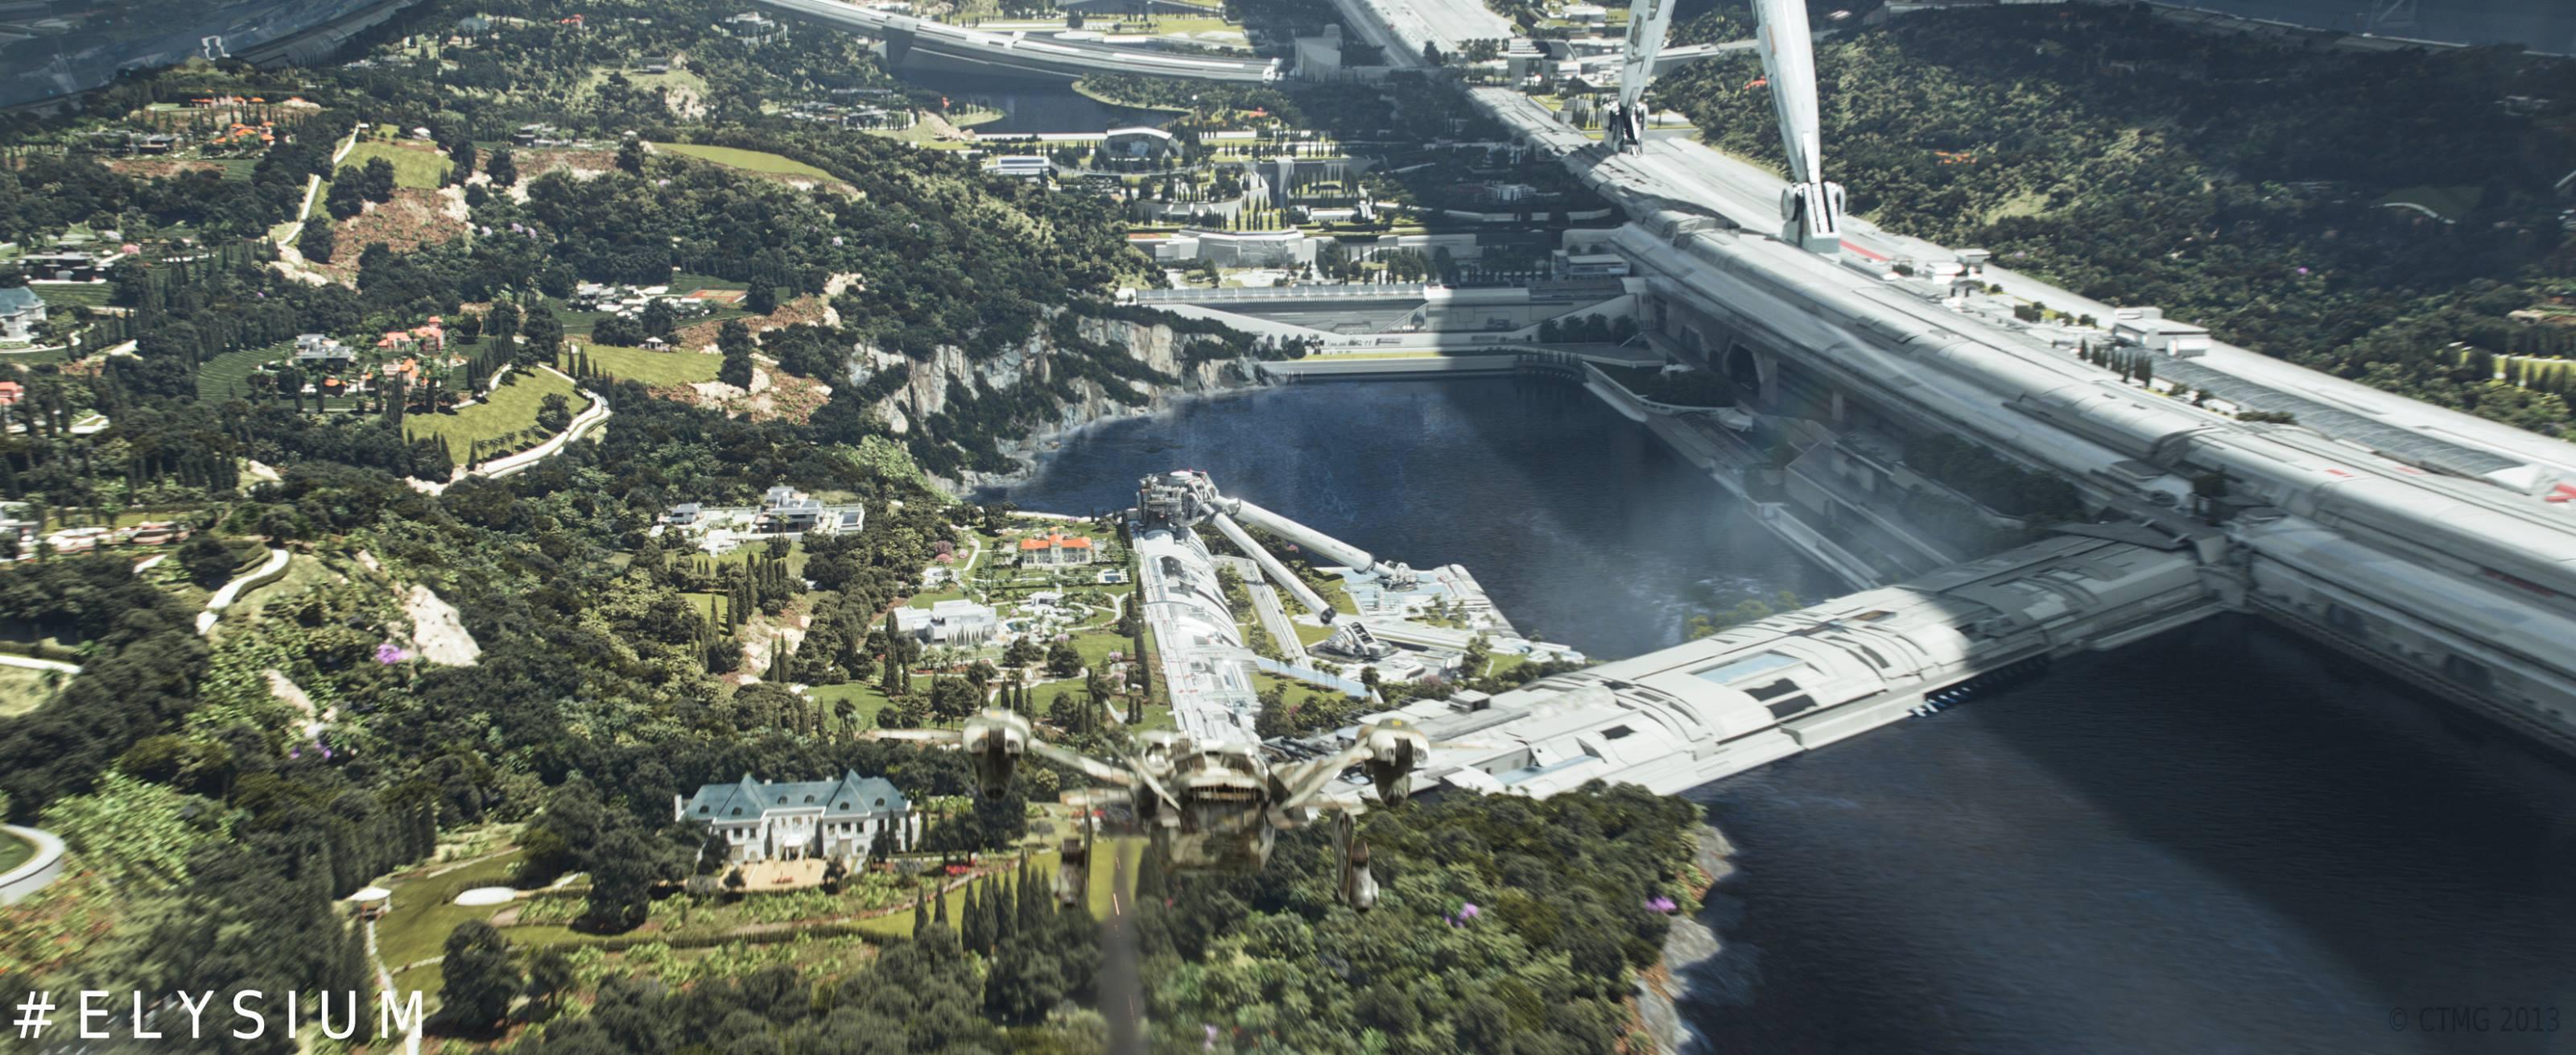 The Alien Next Door: Reaching for Elysium: Why the movie ... |Elysium Planet